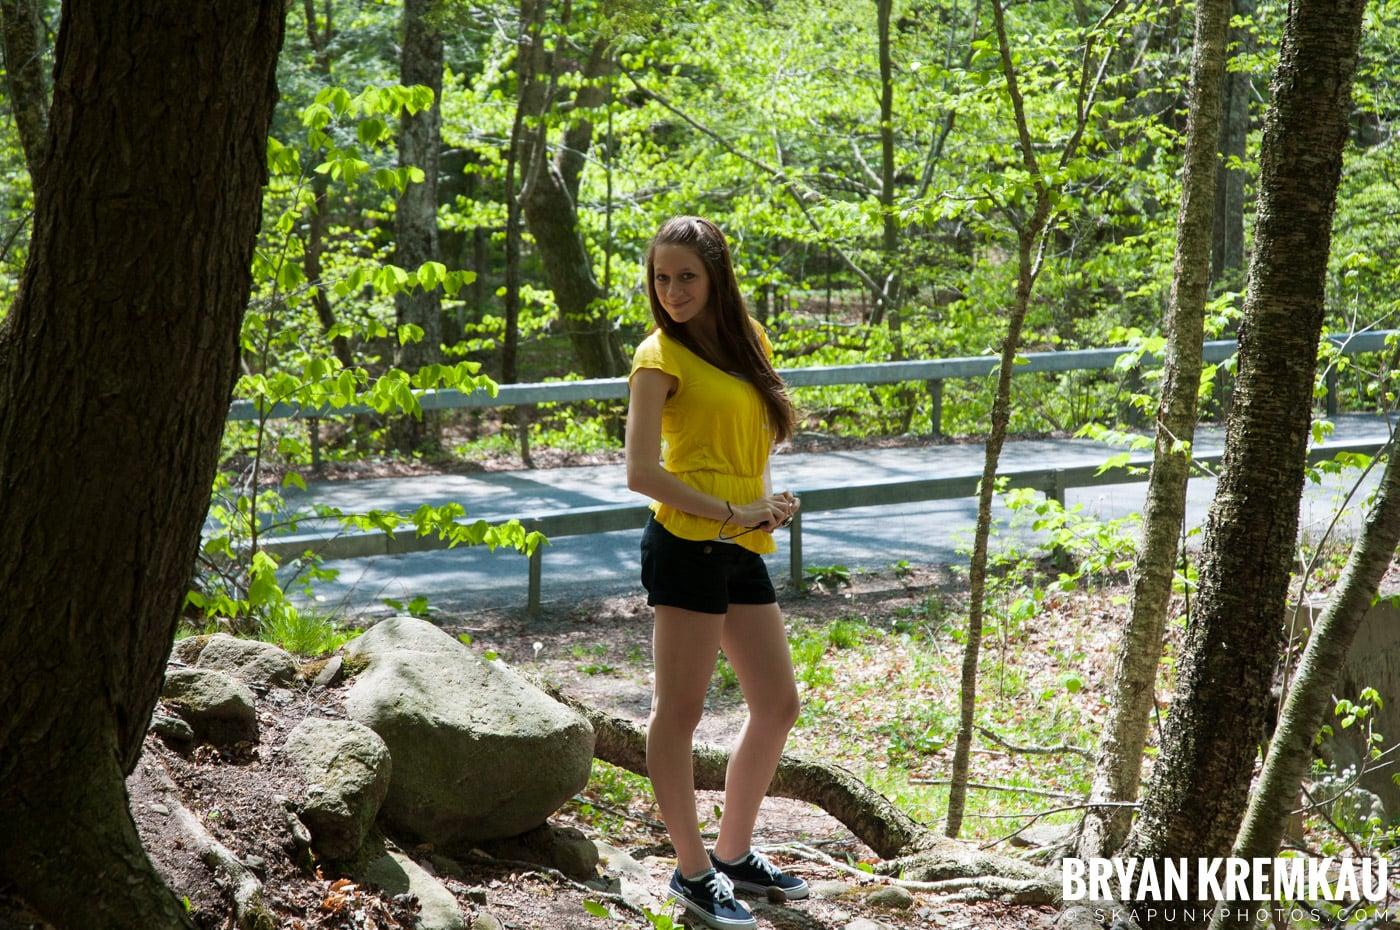 Getting Engaged @ Peekamoose Waterfall, Sundown NY - 5.1.10 (30)